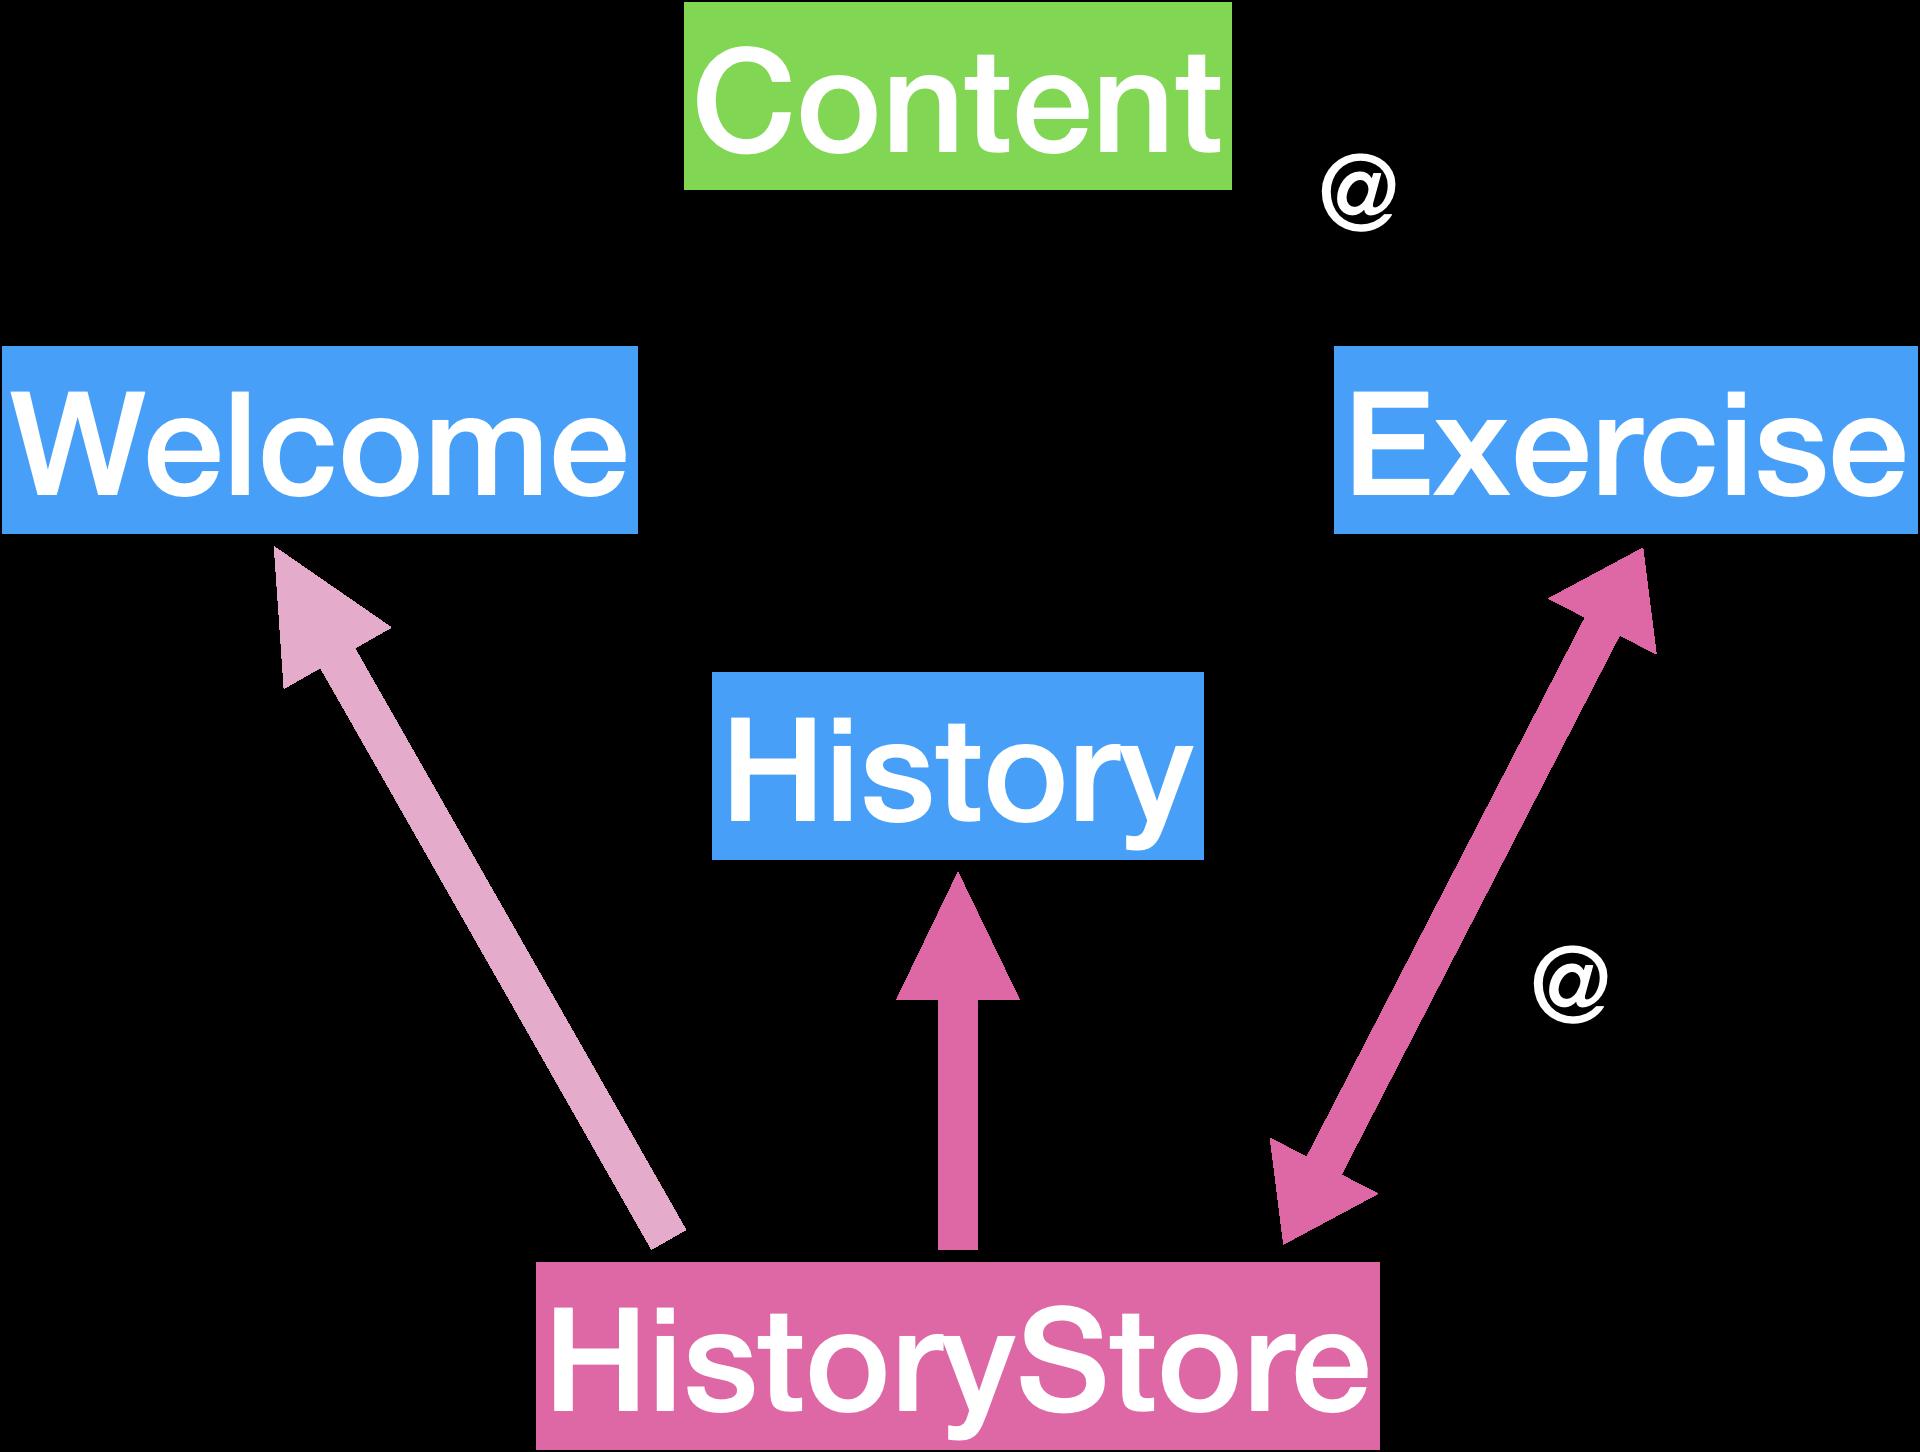 HistoryStore view tree